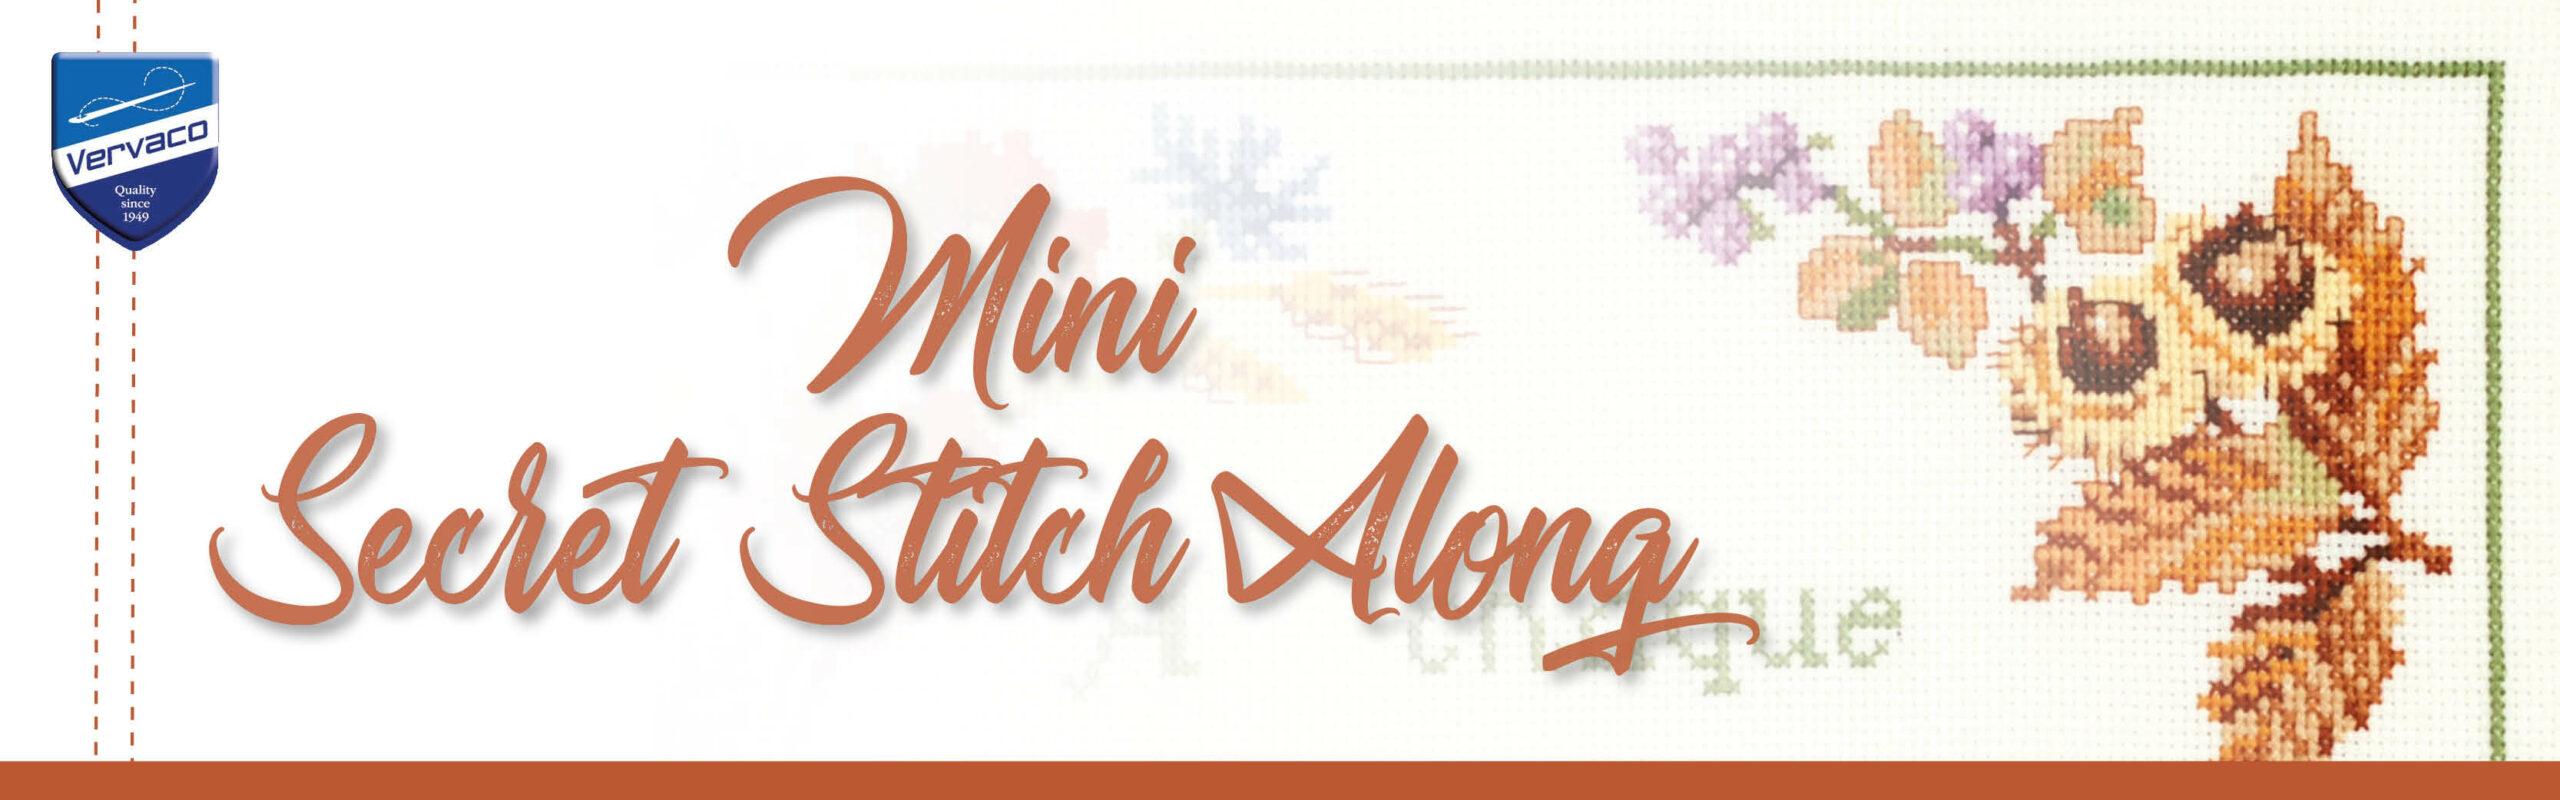 Mini Secret Stitch Along